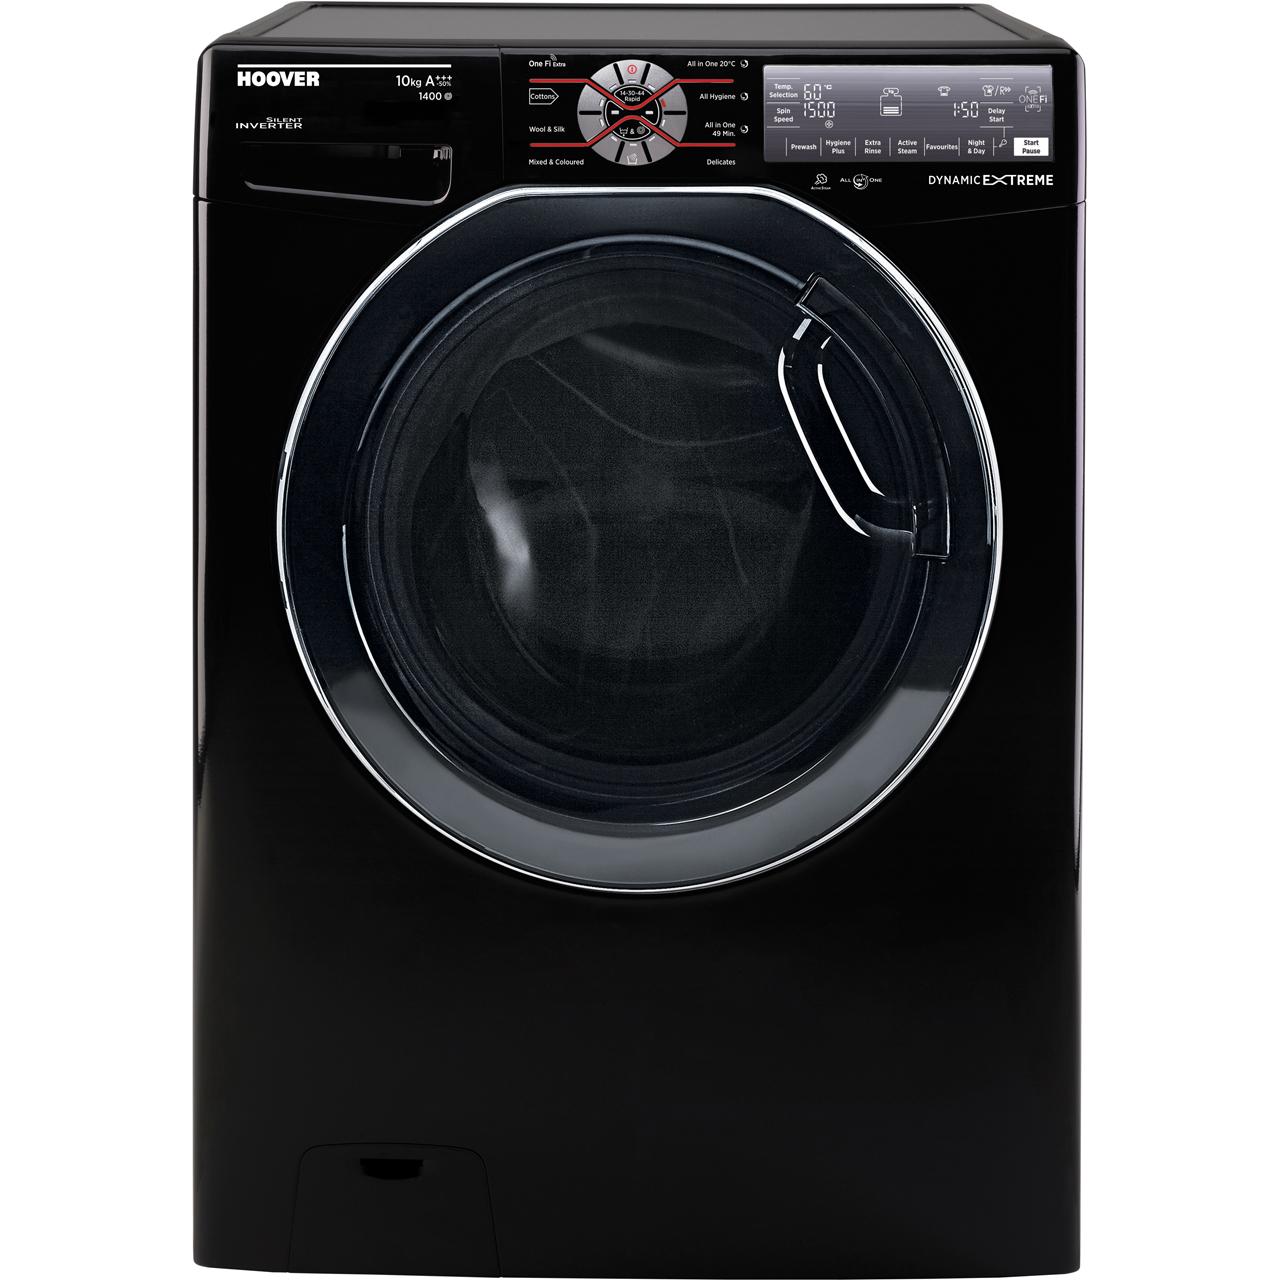 Dwft410ah3b Bk Hoover Washing Machine 10kg Wiring Diagram